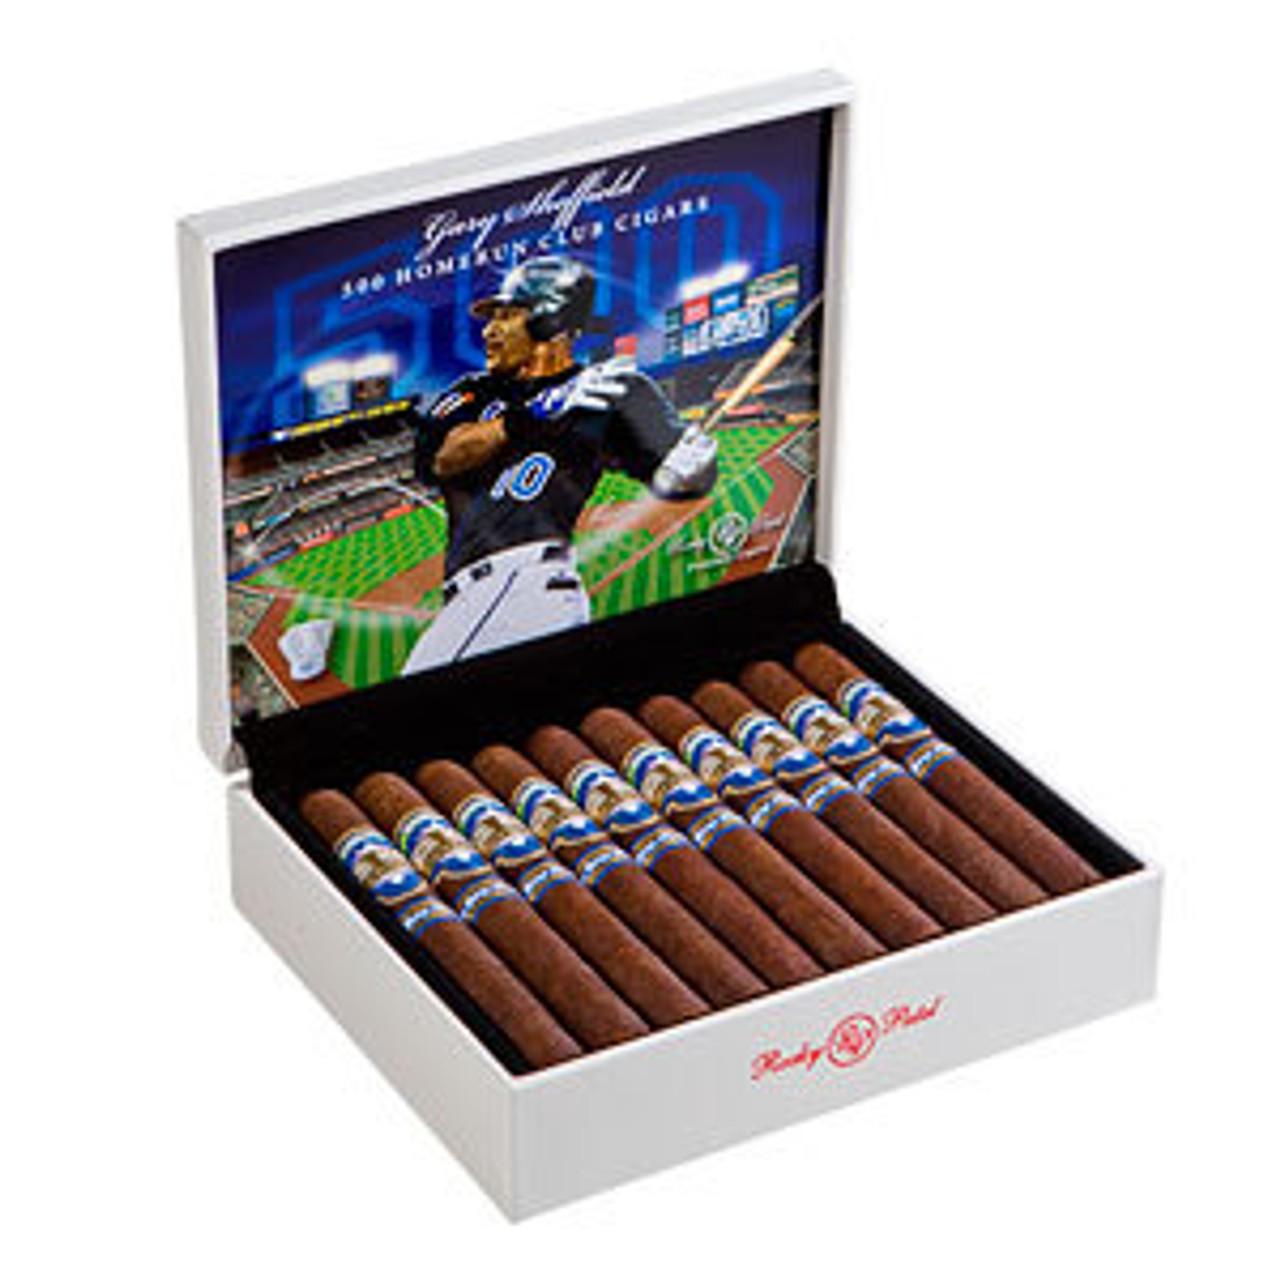 Rocky Patel HR500 by Gary Sheffield Toro Cigars - 6.5 x 52 (Box of 10)